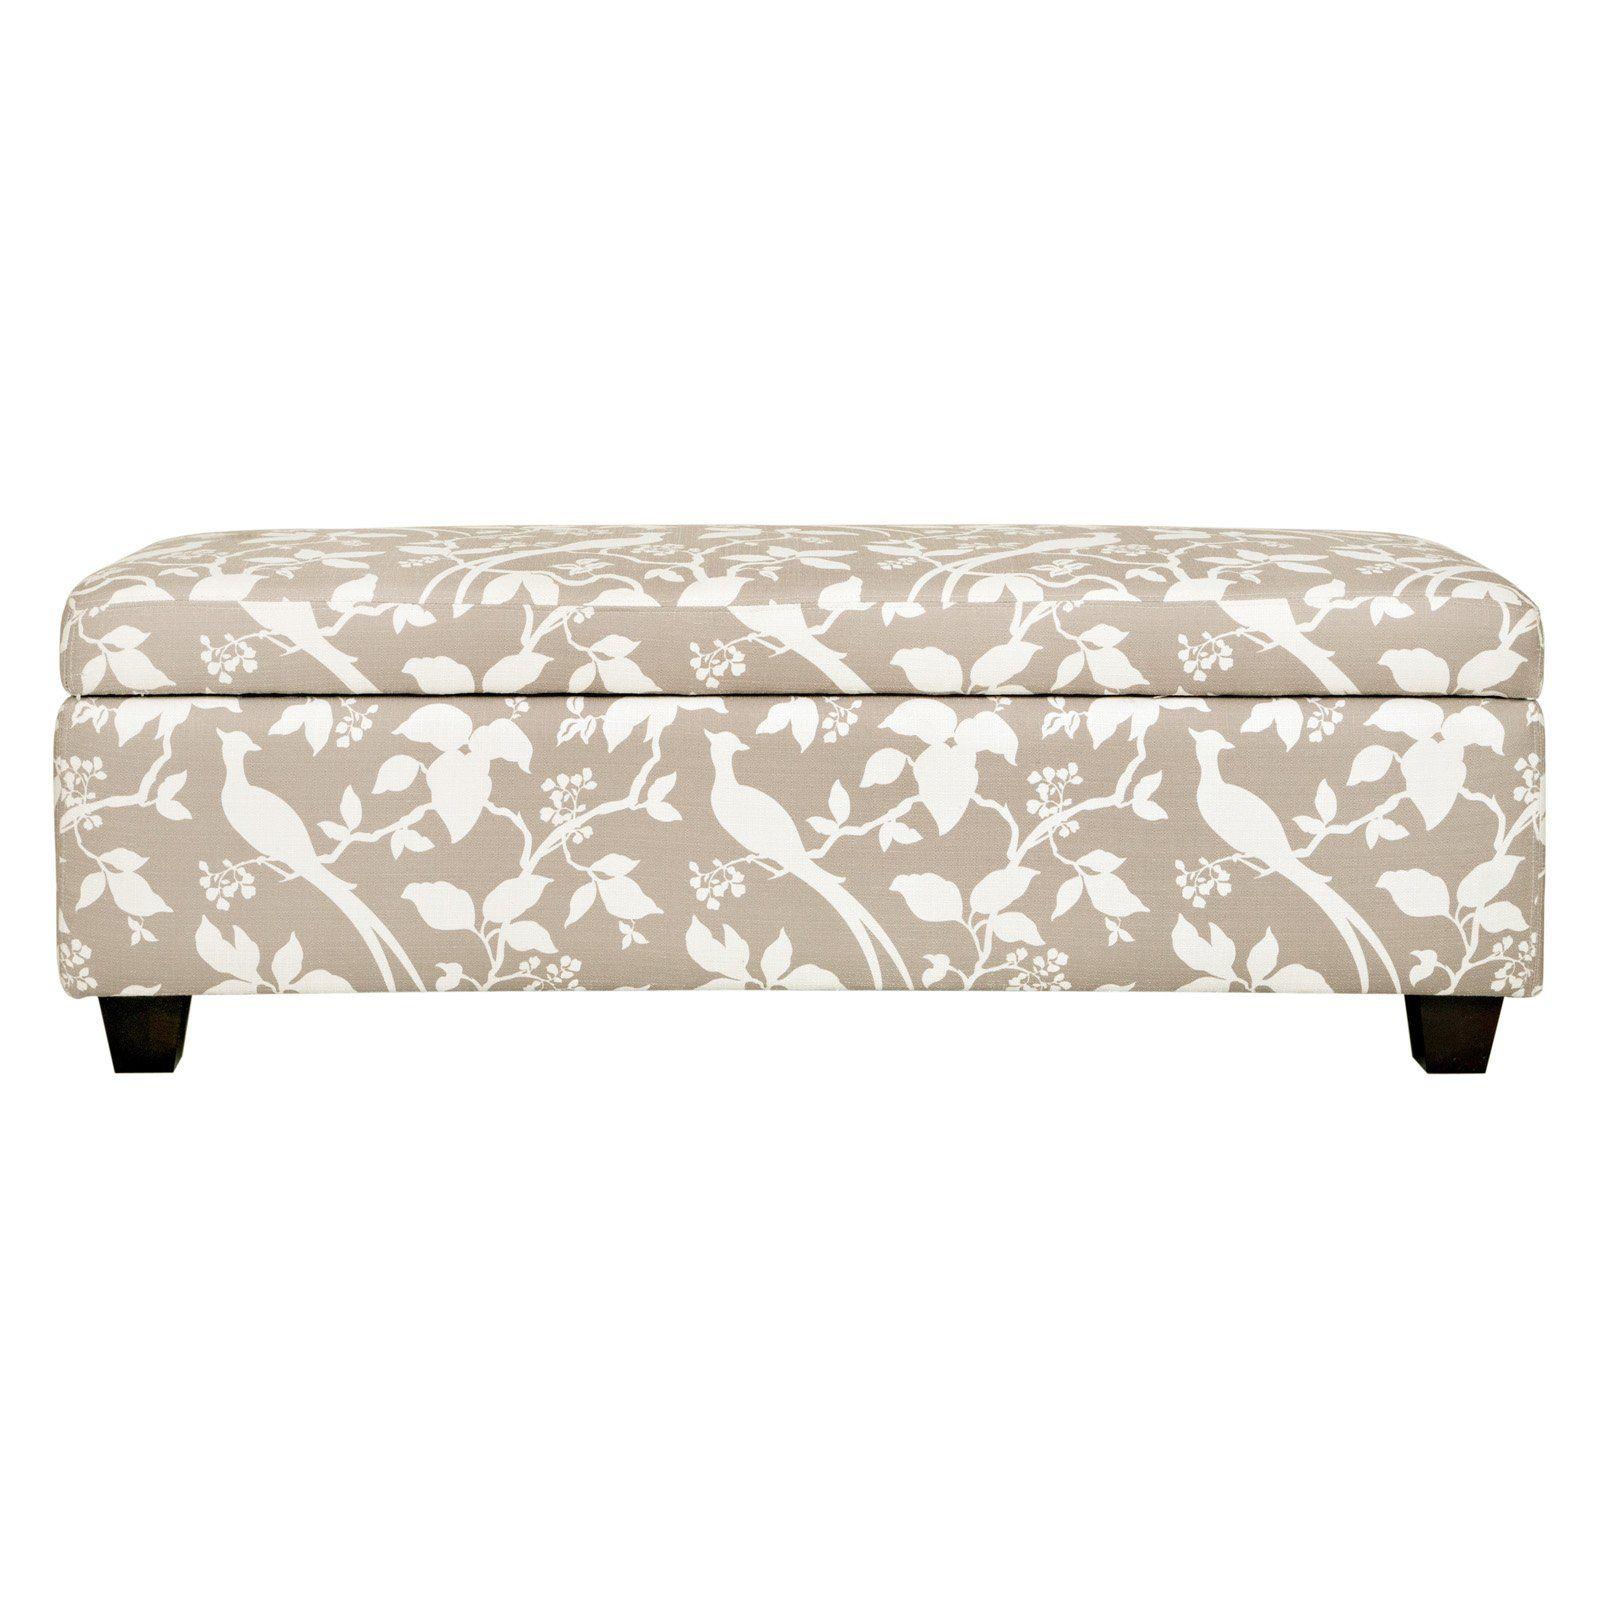 Have to have it angelohome kent storage bench ottoman modern bird branch tan 199 99